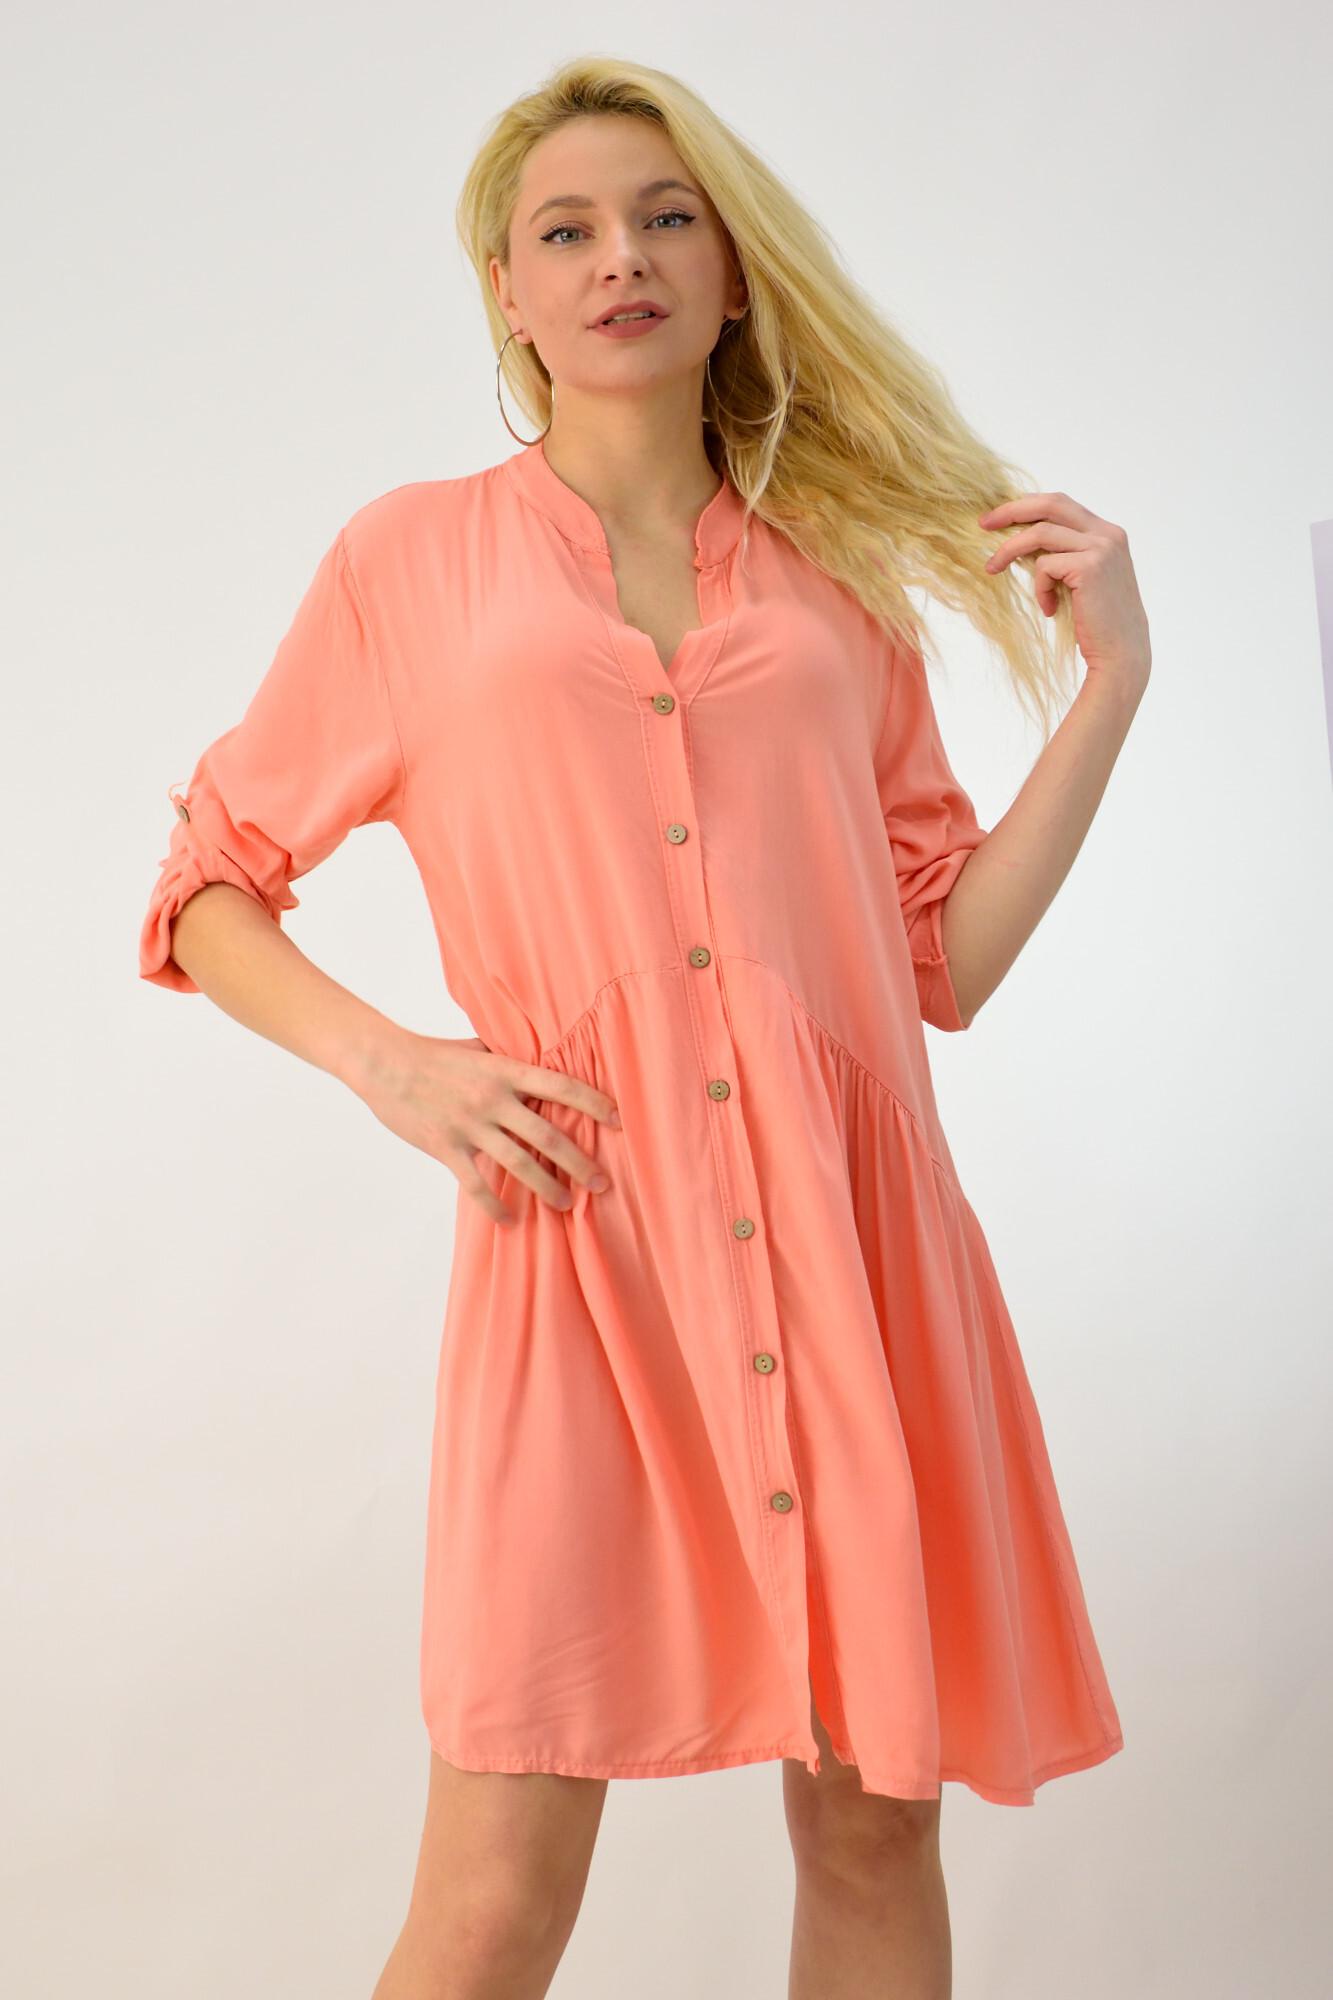 2293ff6f37fb Γυναικείο φόρεμα σε στυλ πουκάμισο. Tap to expand